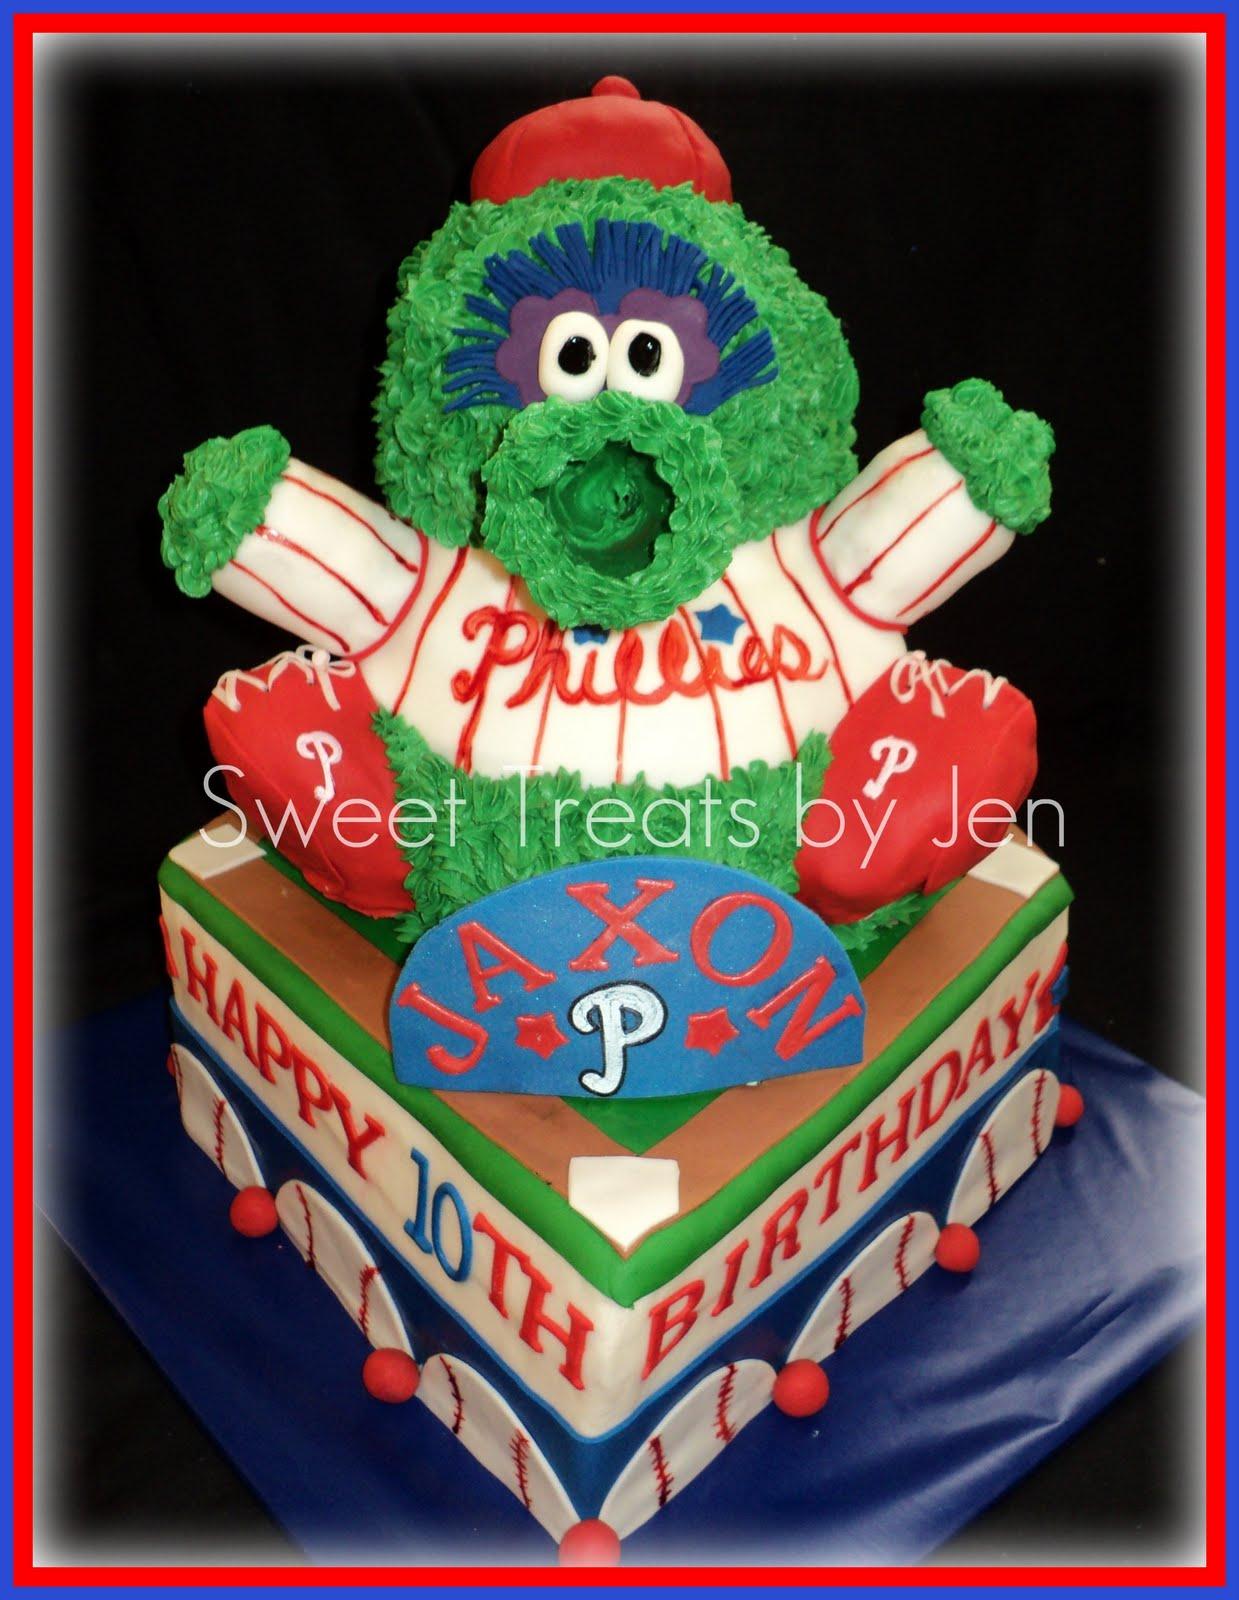 Phillies birthday package